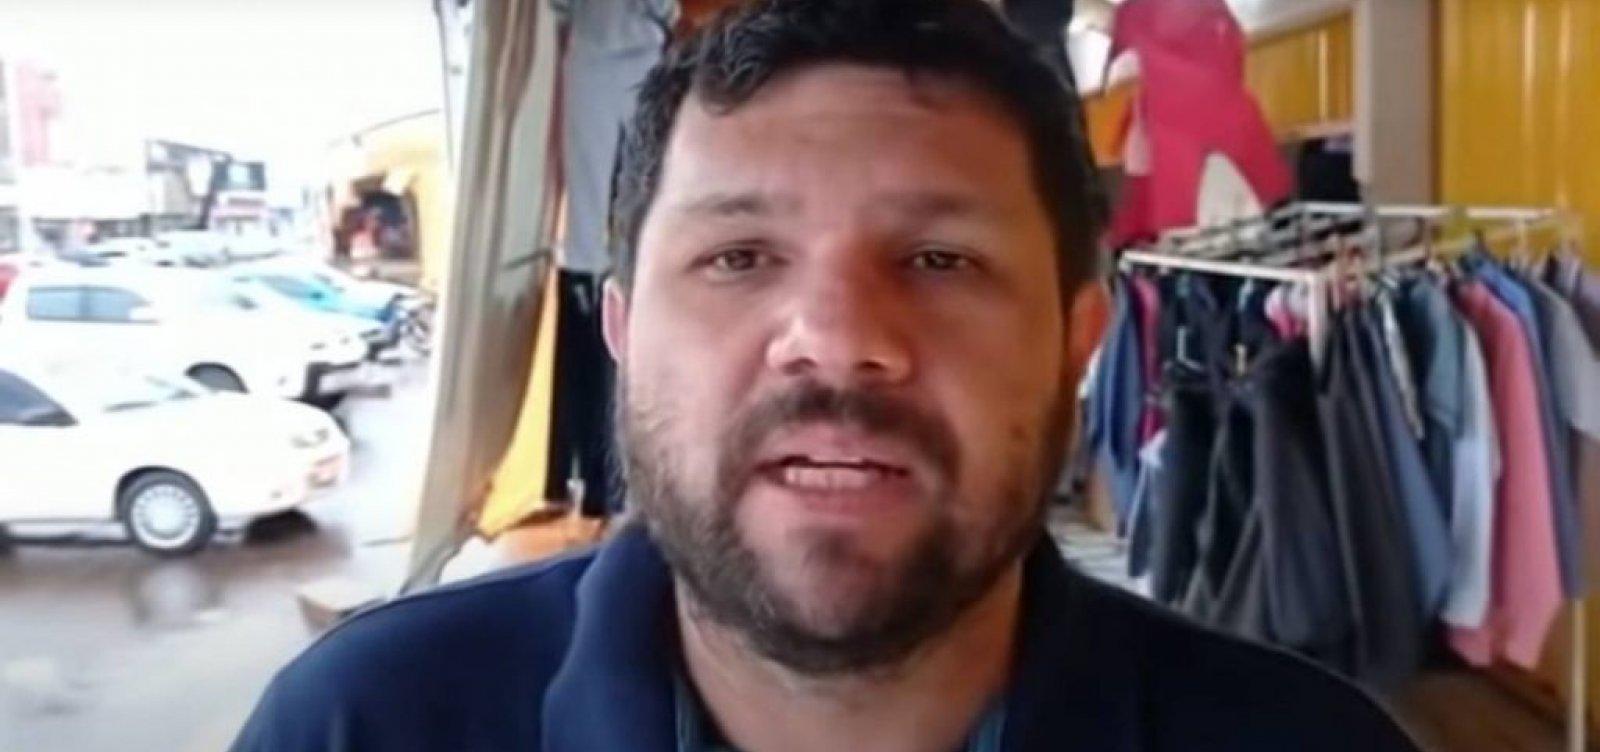 Justiça suspende conta de blogueiro bolsonarista e impede compartilhamento de vídeo no WhatsApp